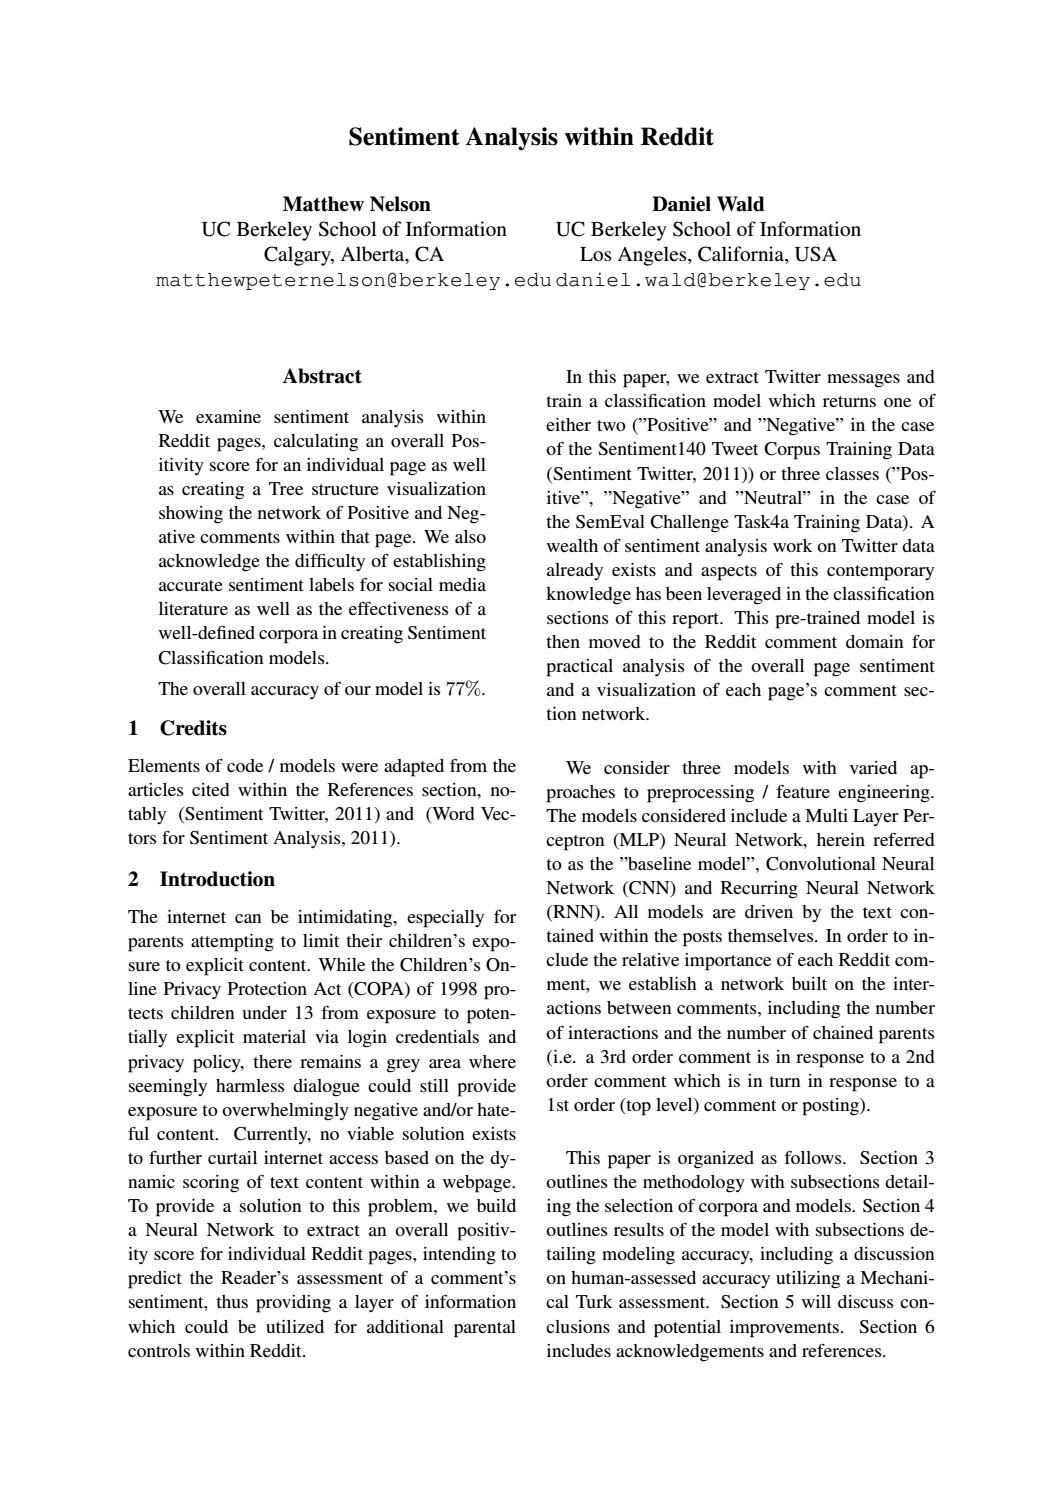 Sentiment Analysis in Reddit - Paper by Matthew Nelson - issuu